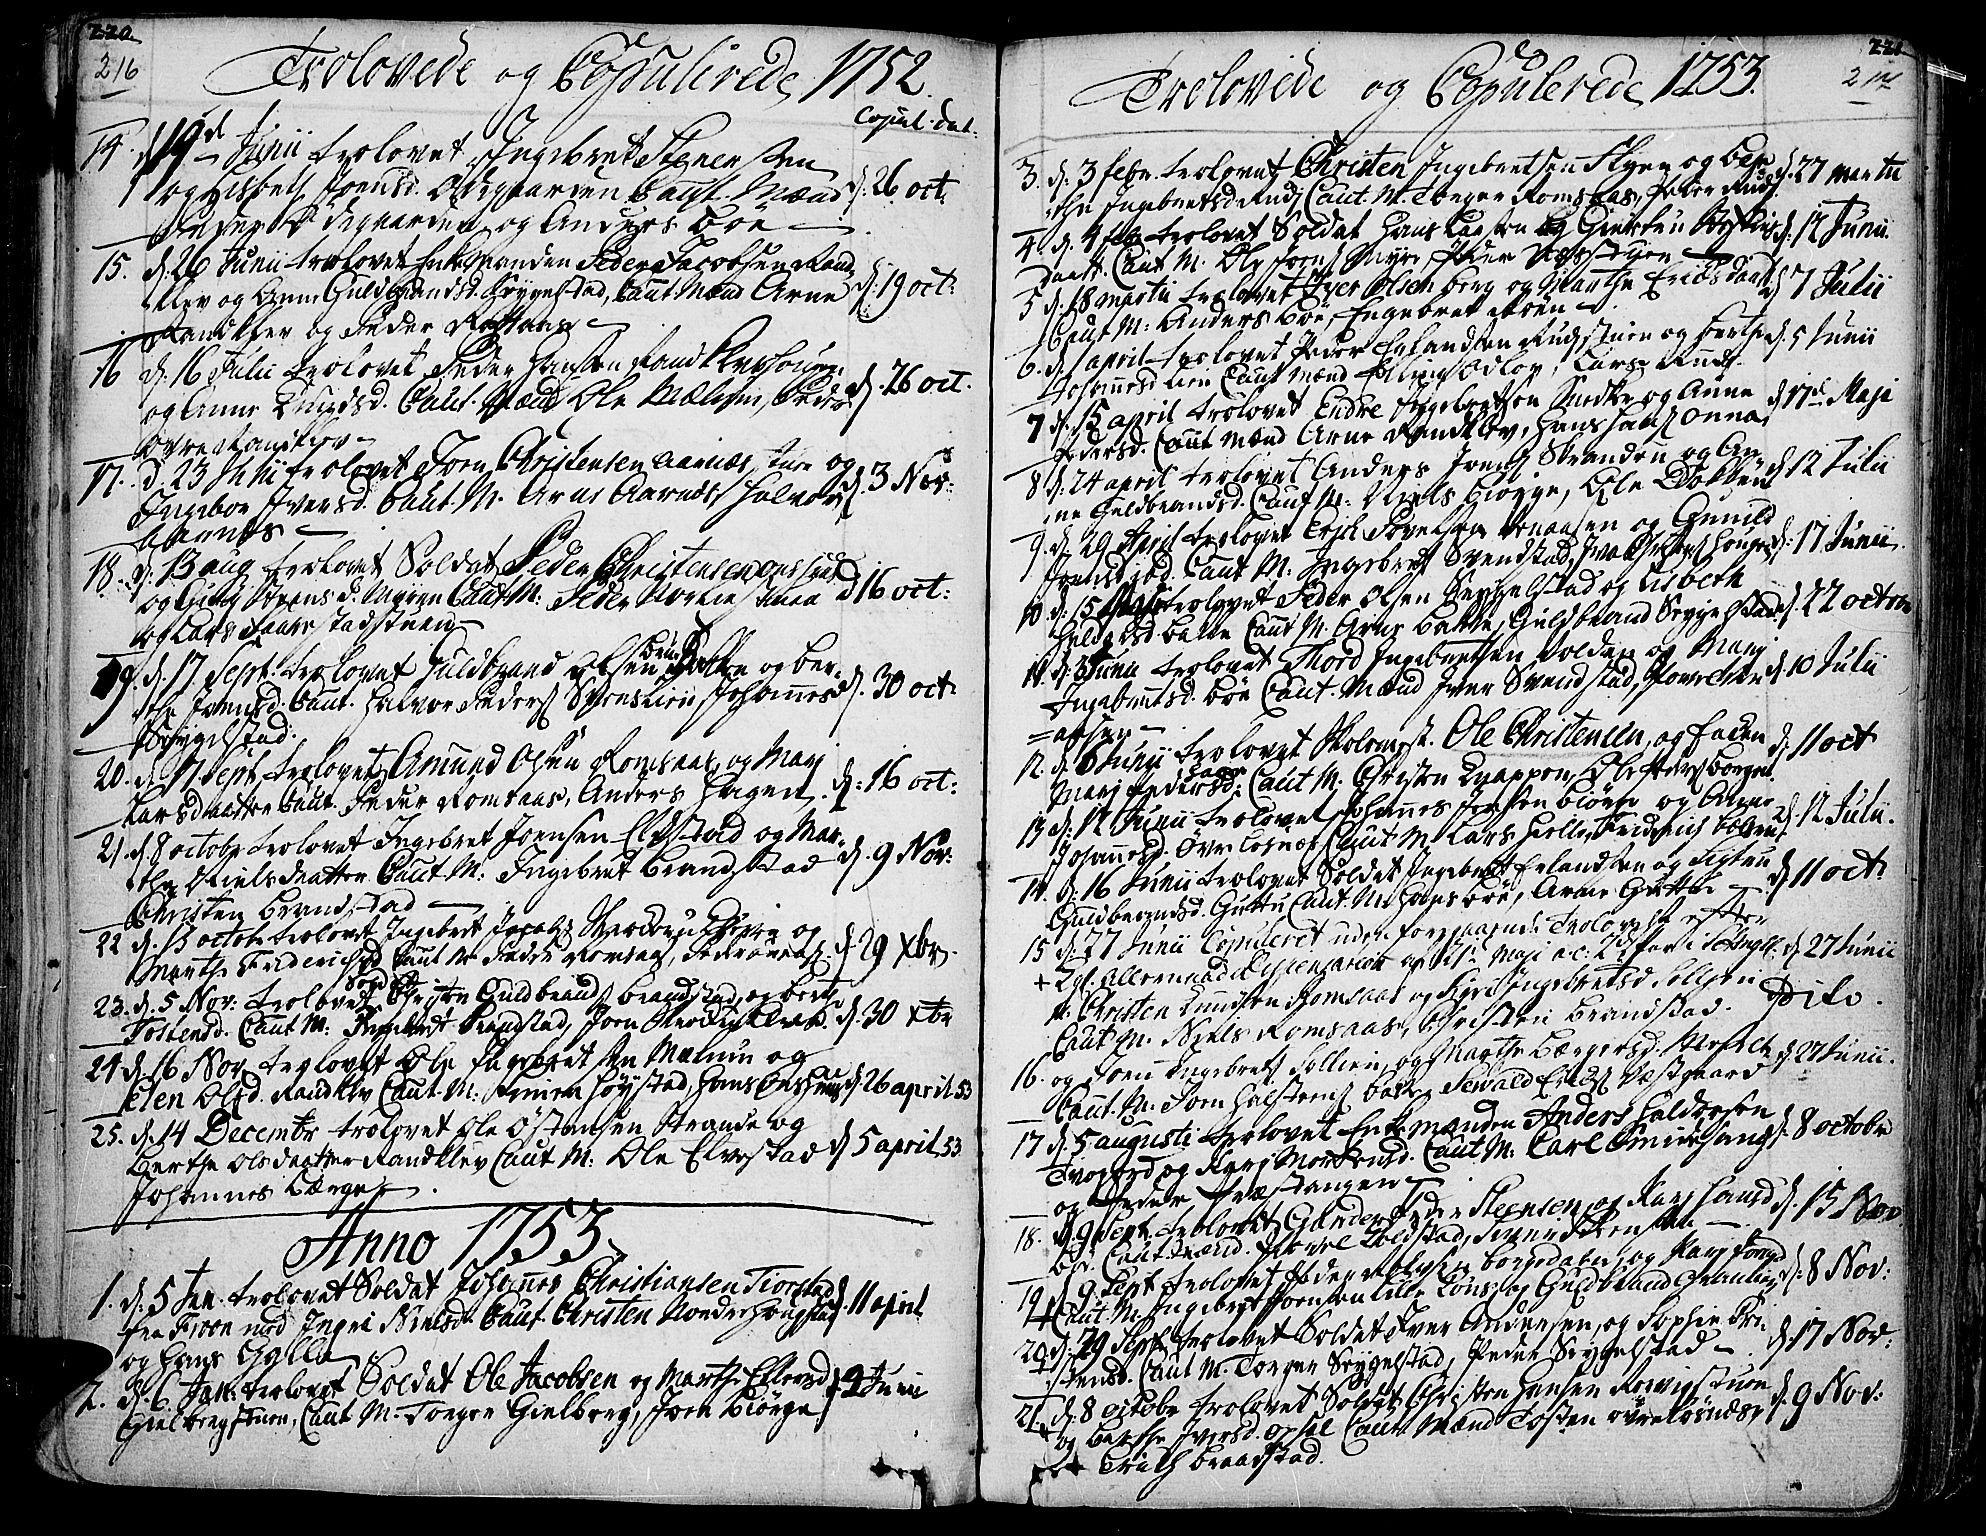 SAH, Ringebu prestekontor, Ministerialbok nr. 2, 1734-1780, s. 216-217